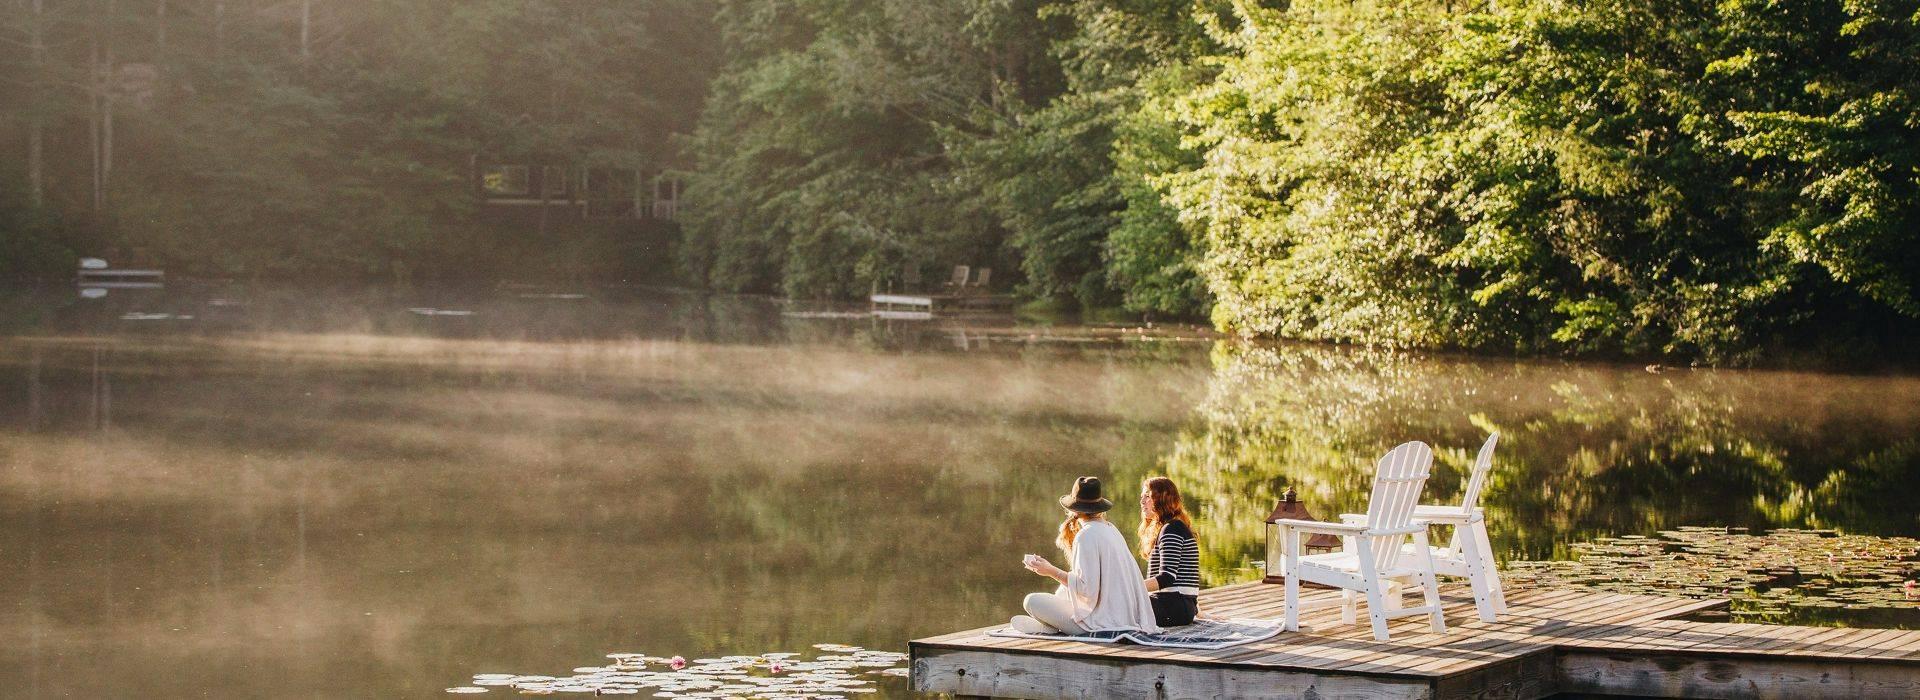 North Carolina Wellness Vacations